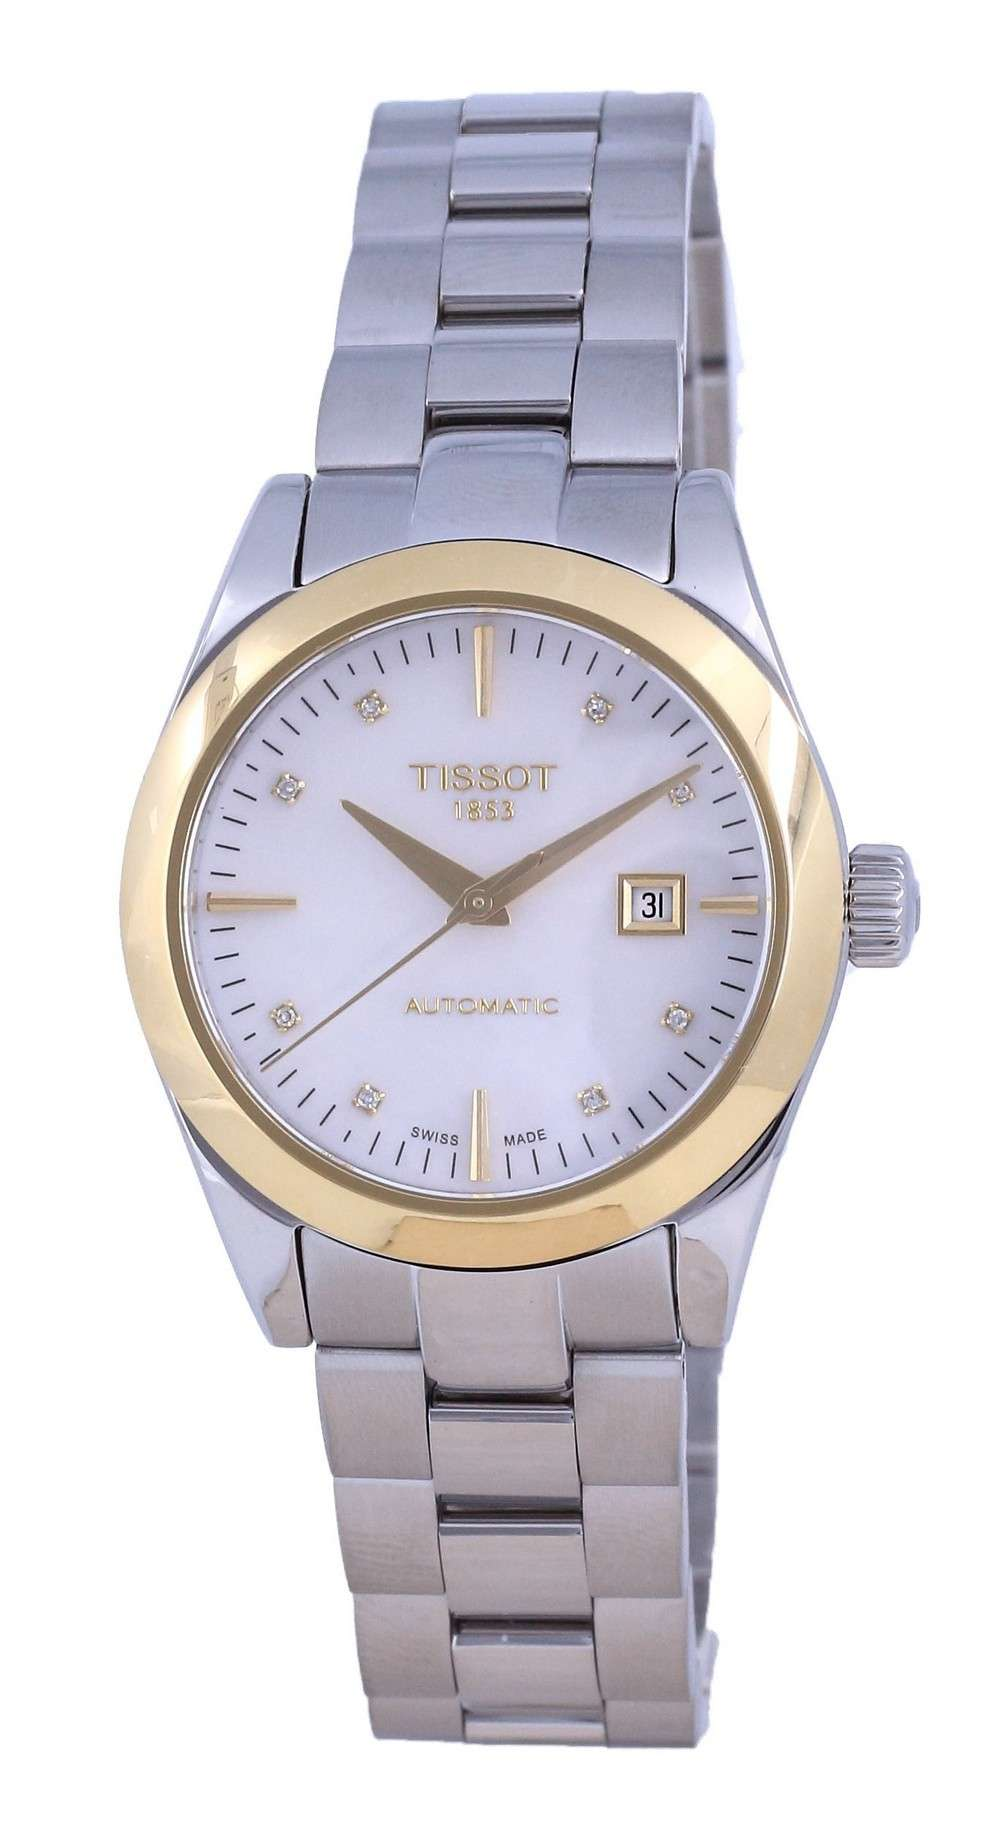 Tissot T-Gold T-My Lady 18K Gold Diamond Acentos Automático T930.007.41.116.00 T9300074111600 Reloj para mujer